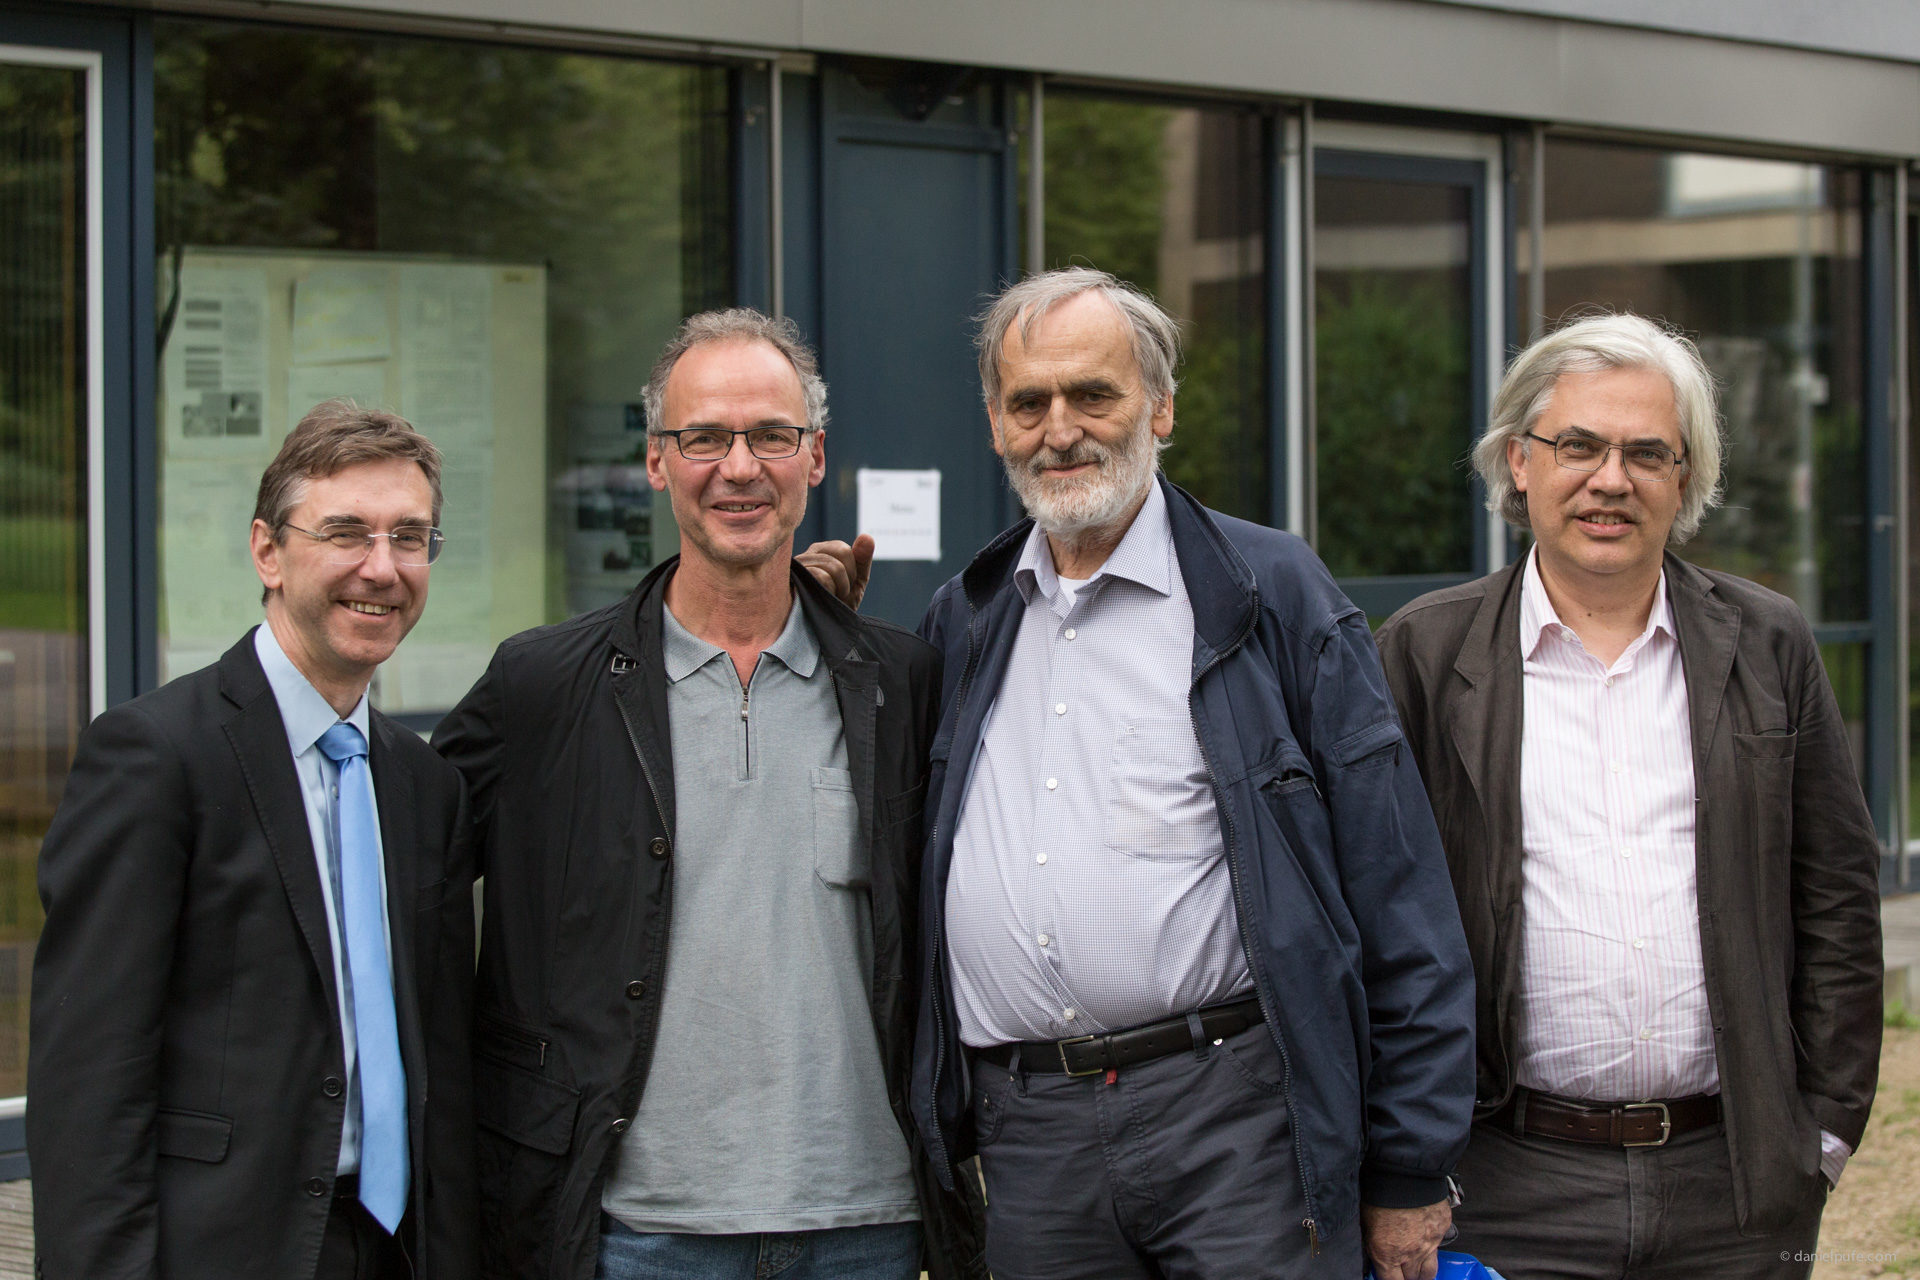 Lucas Fels - Helmut Lachenmann - Paul Archbold - Jürgen Krebber